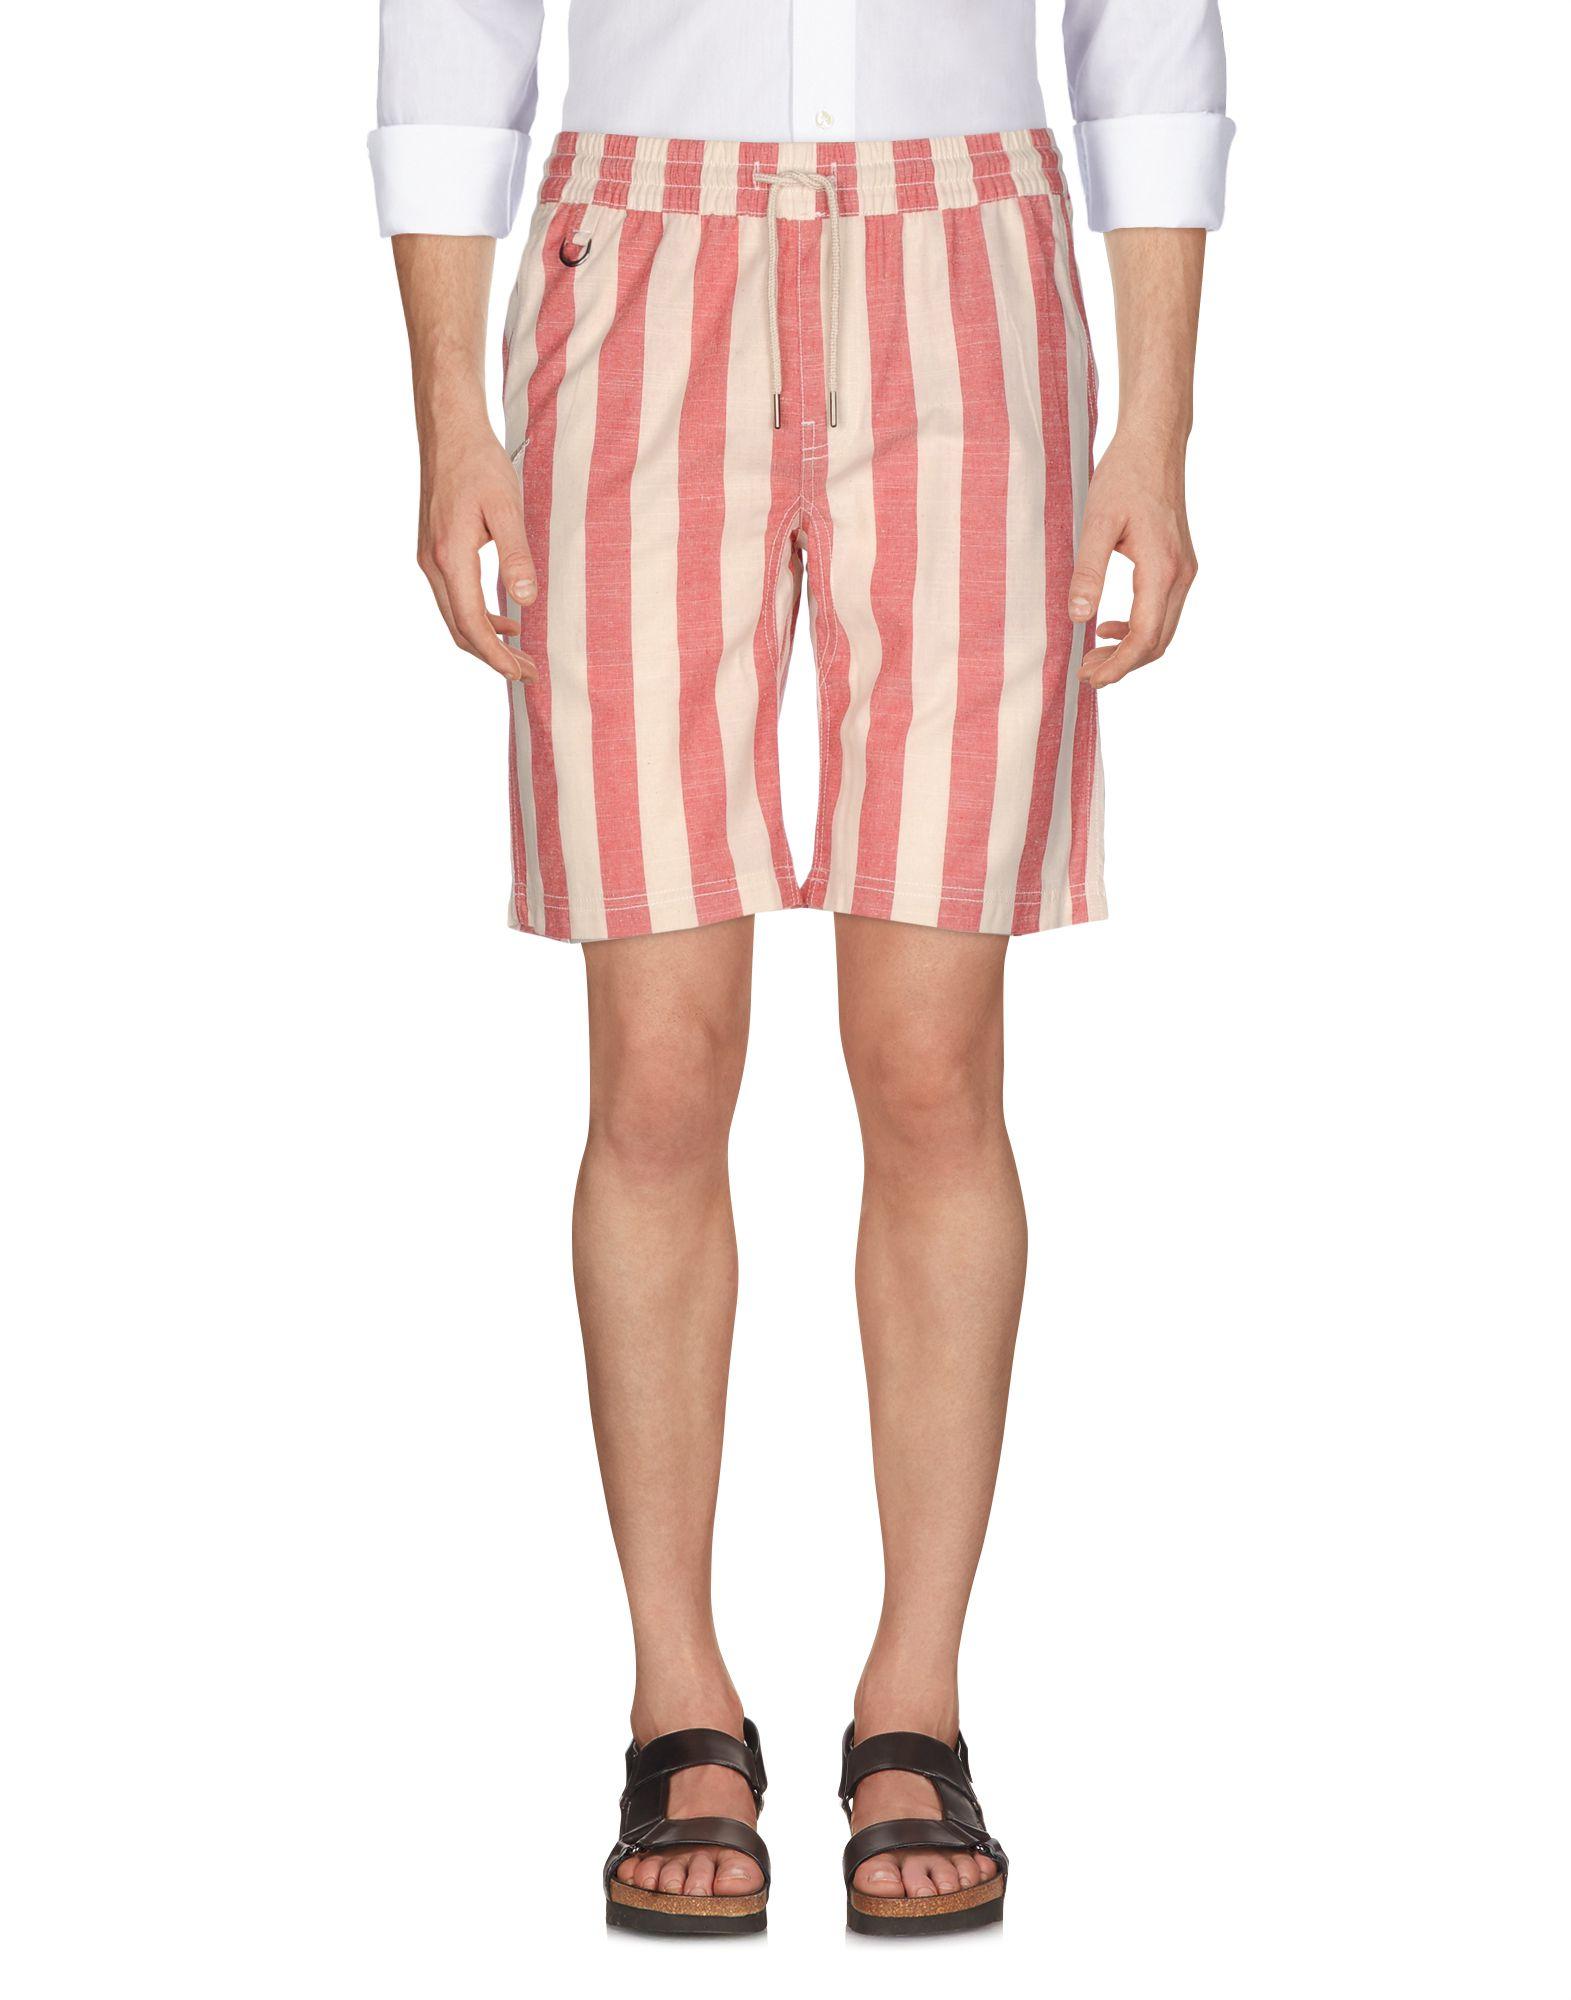 PUBLISH Shorts & Bermuda in Red